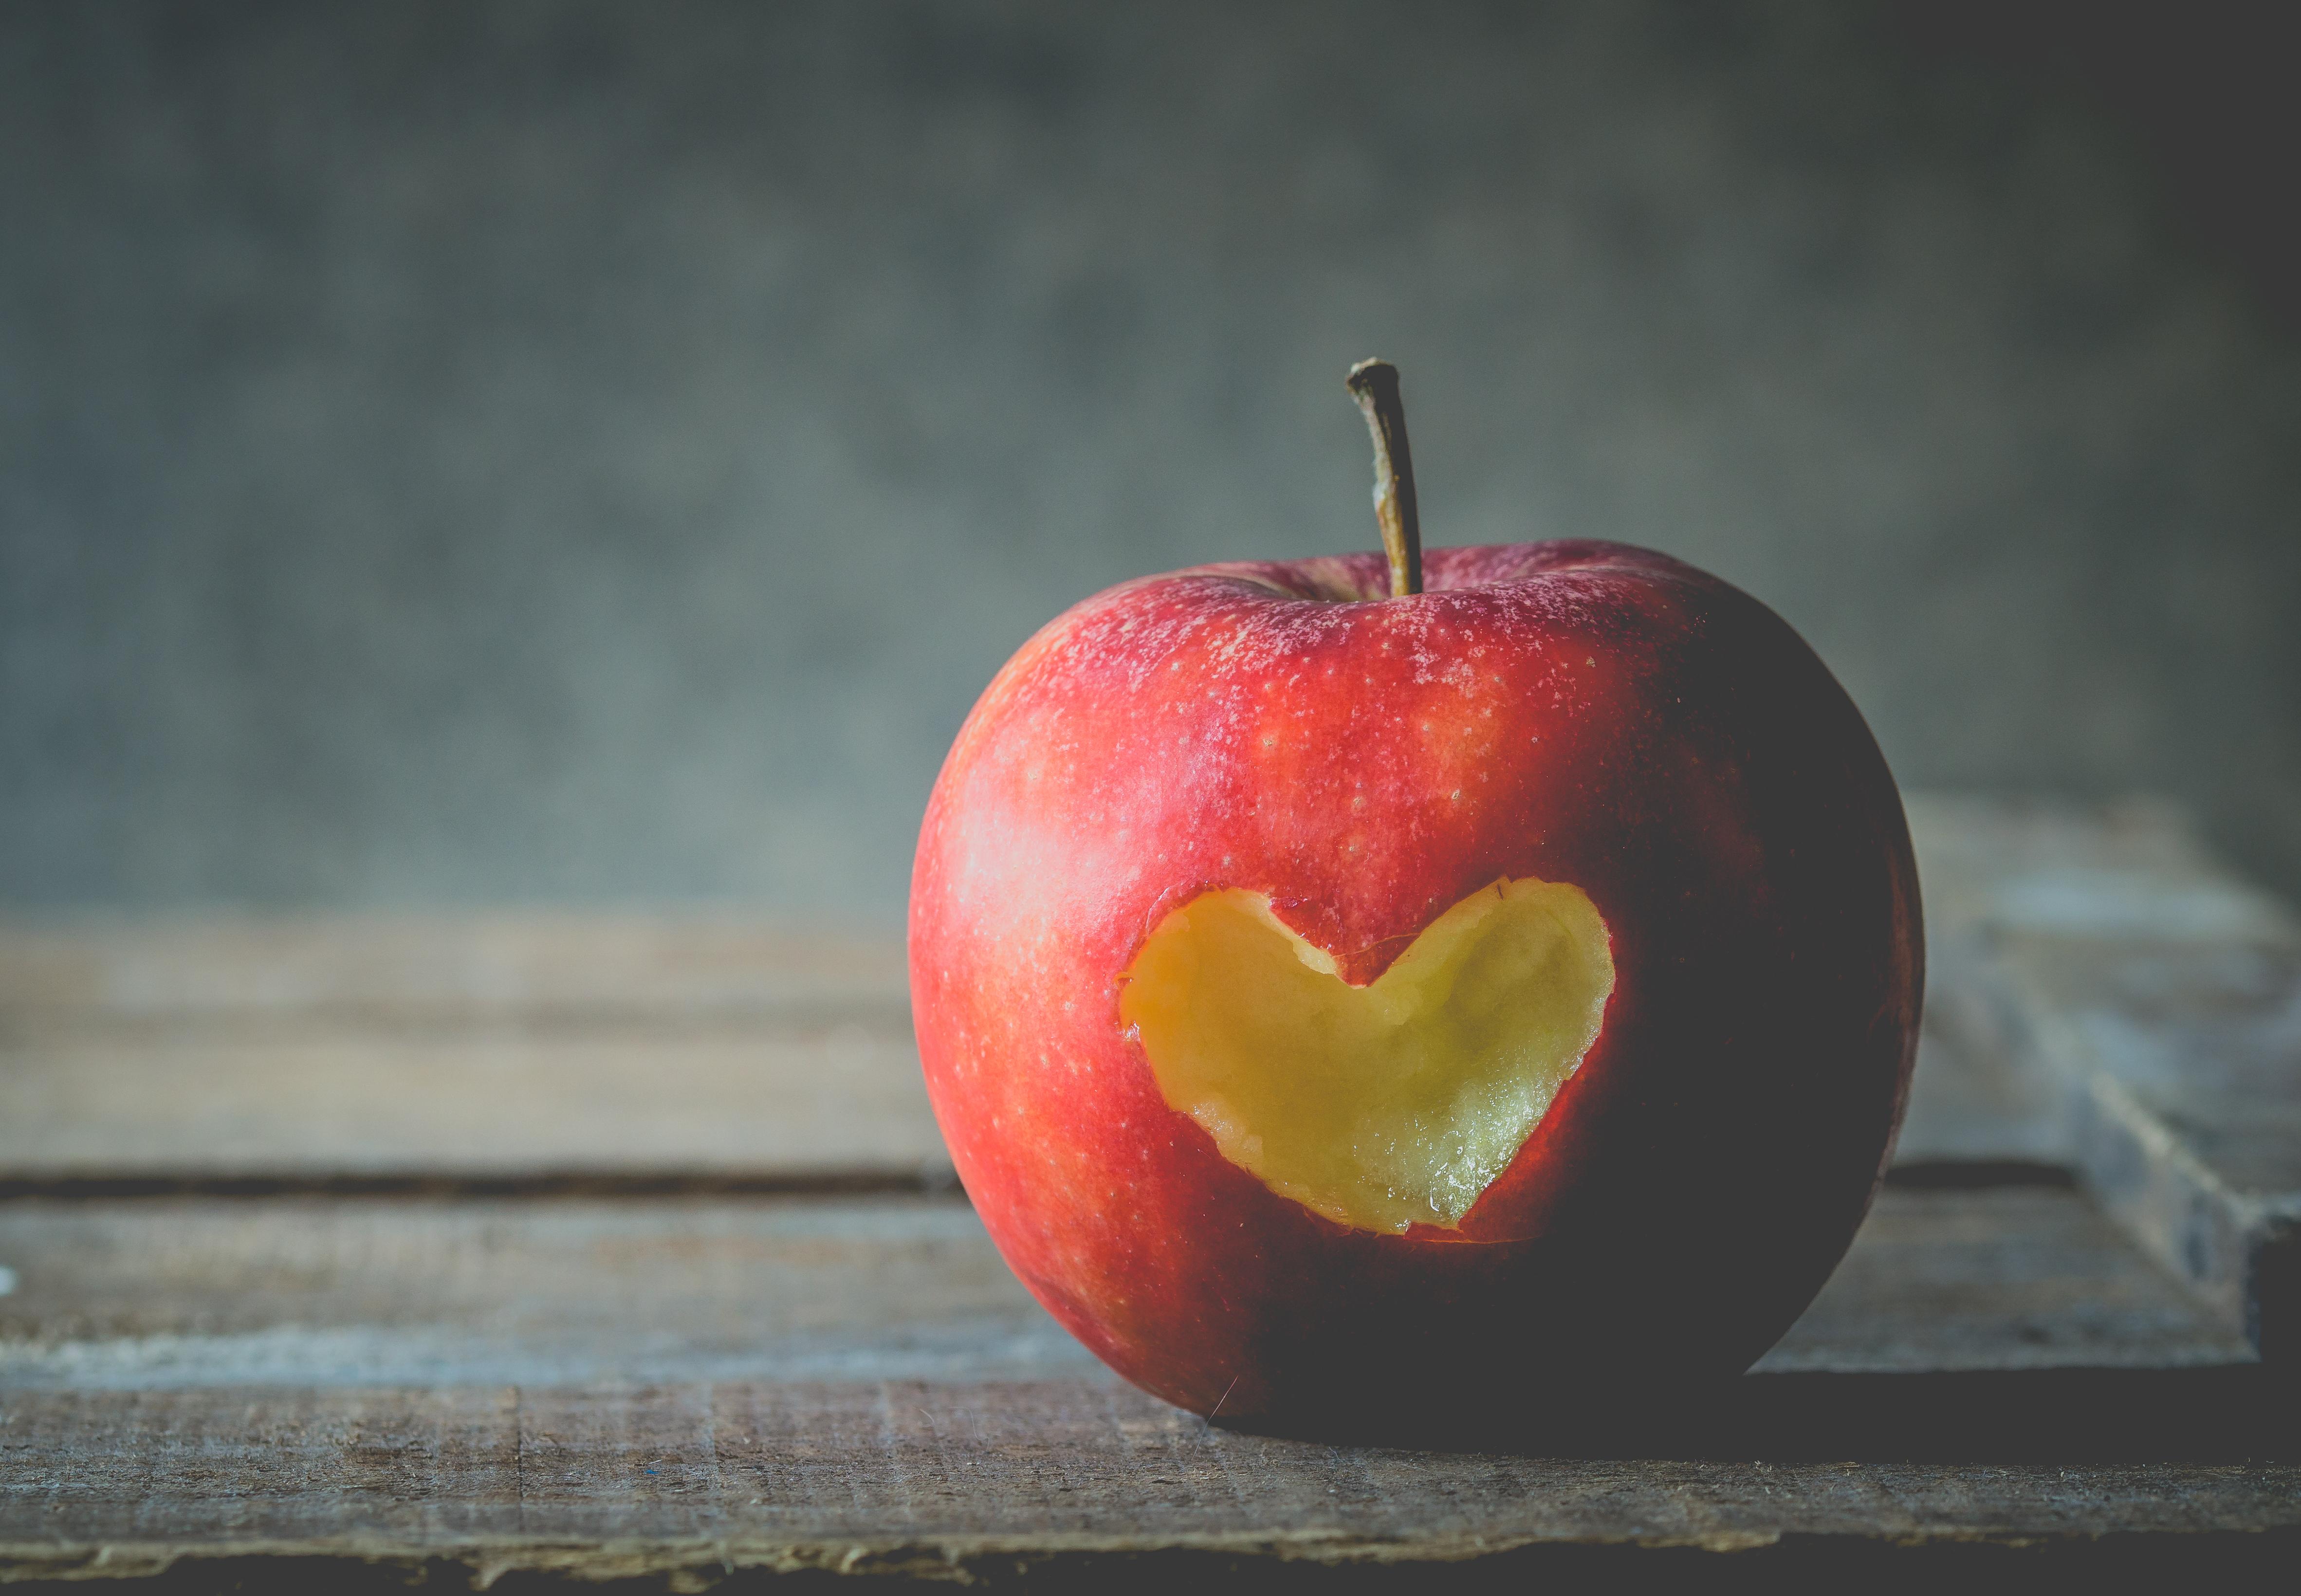 apple-fruits-fruit-heart-love-food-1418868-pxhere.com.jpg